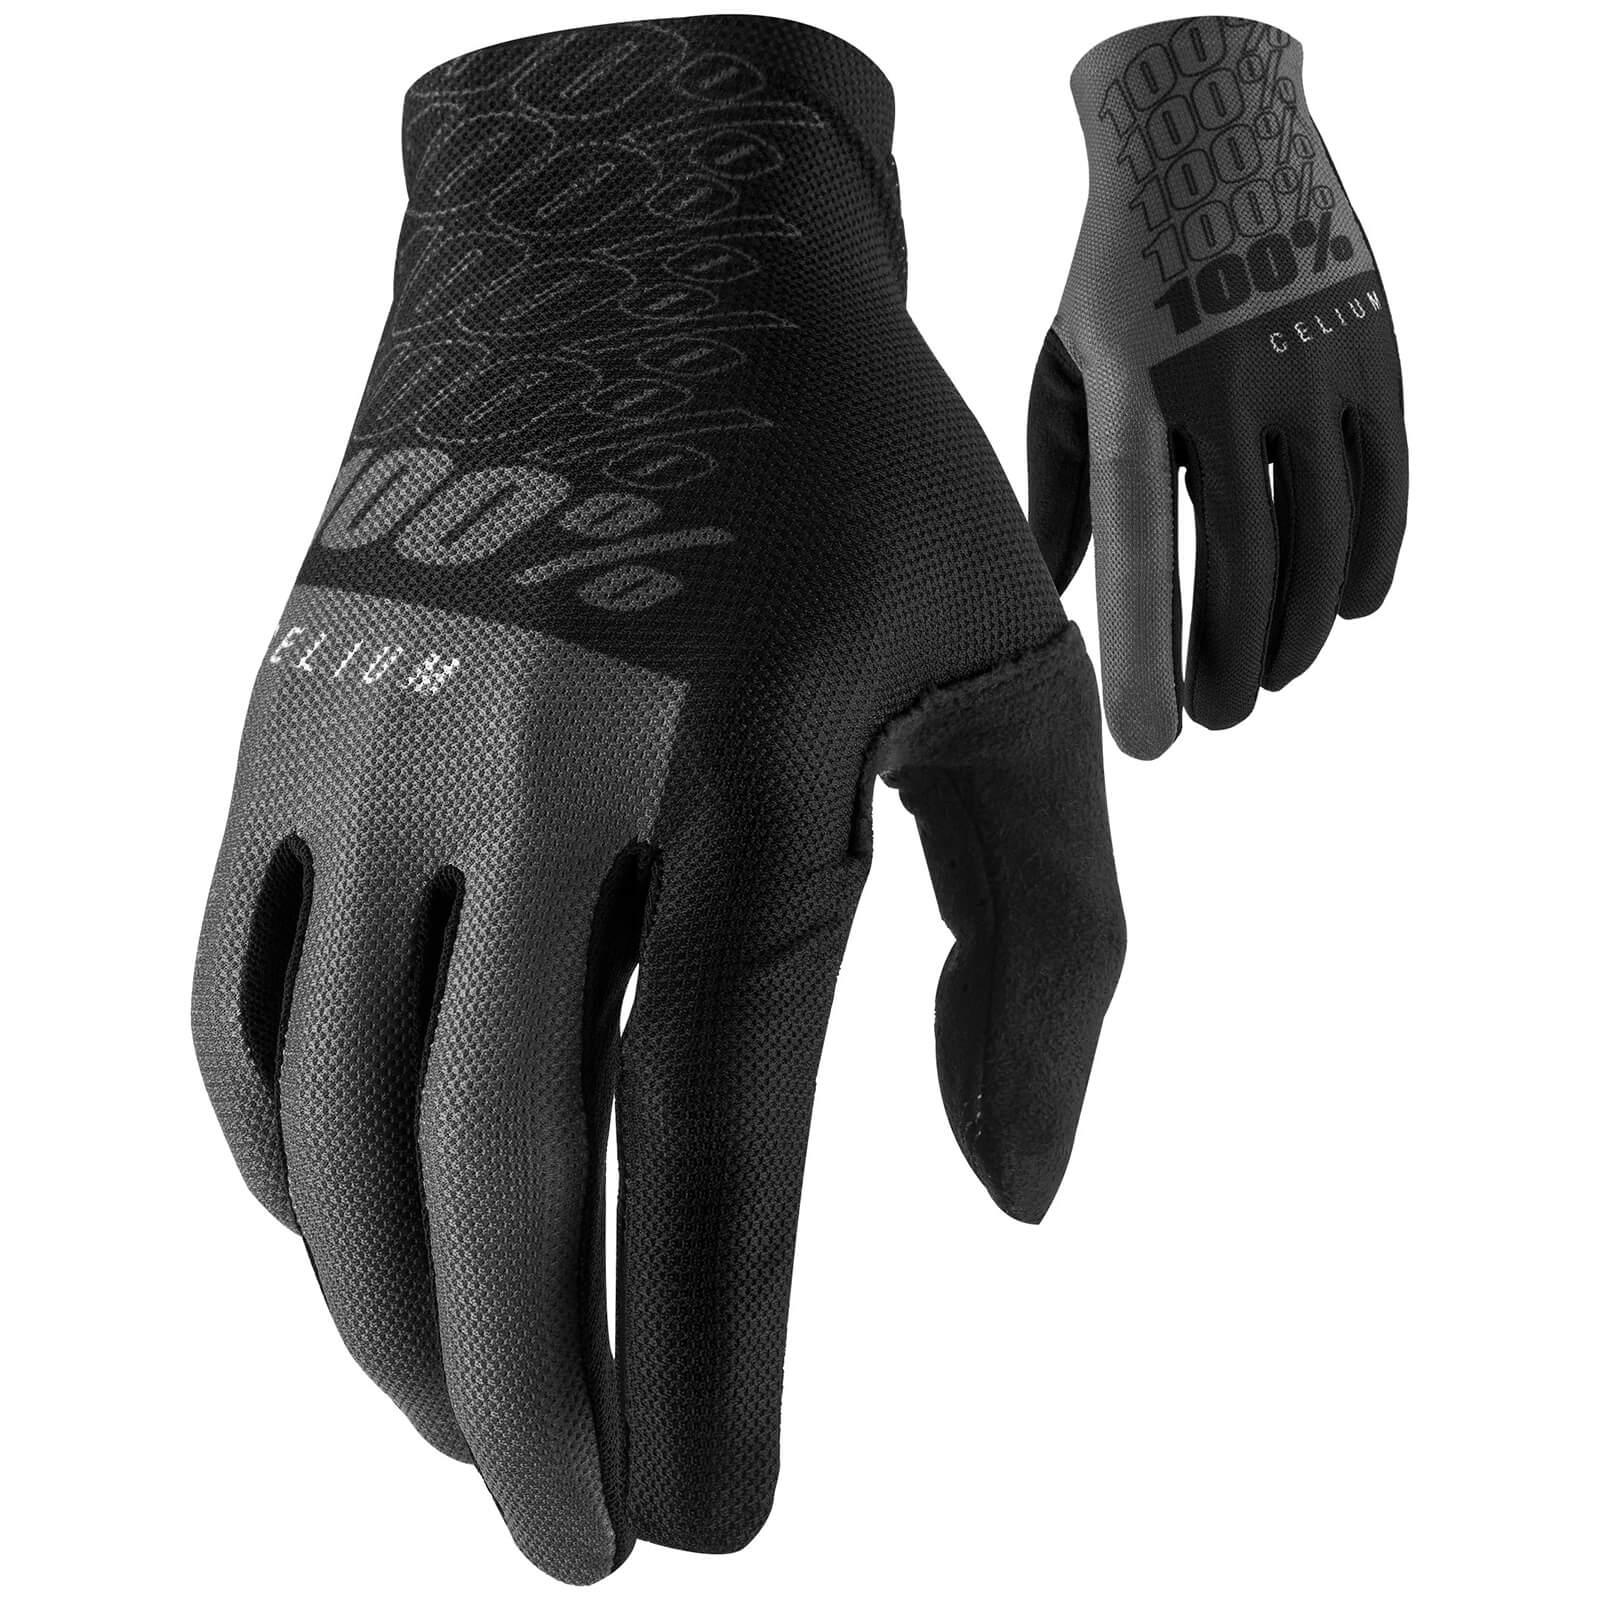 100% Celium Mtb Gloves - Xxl - Black/grey